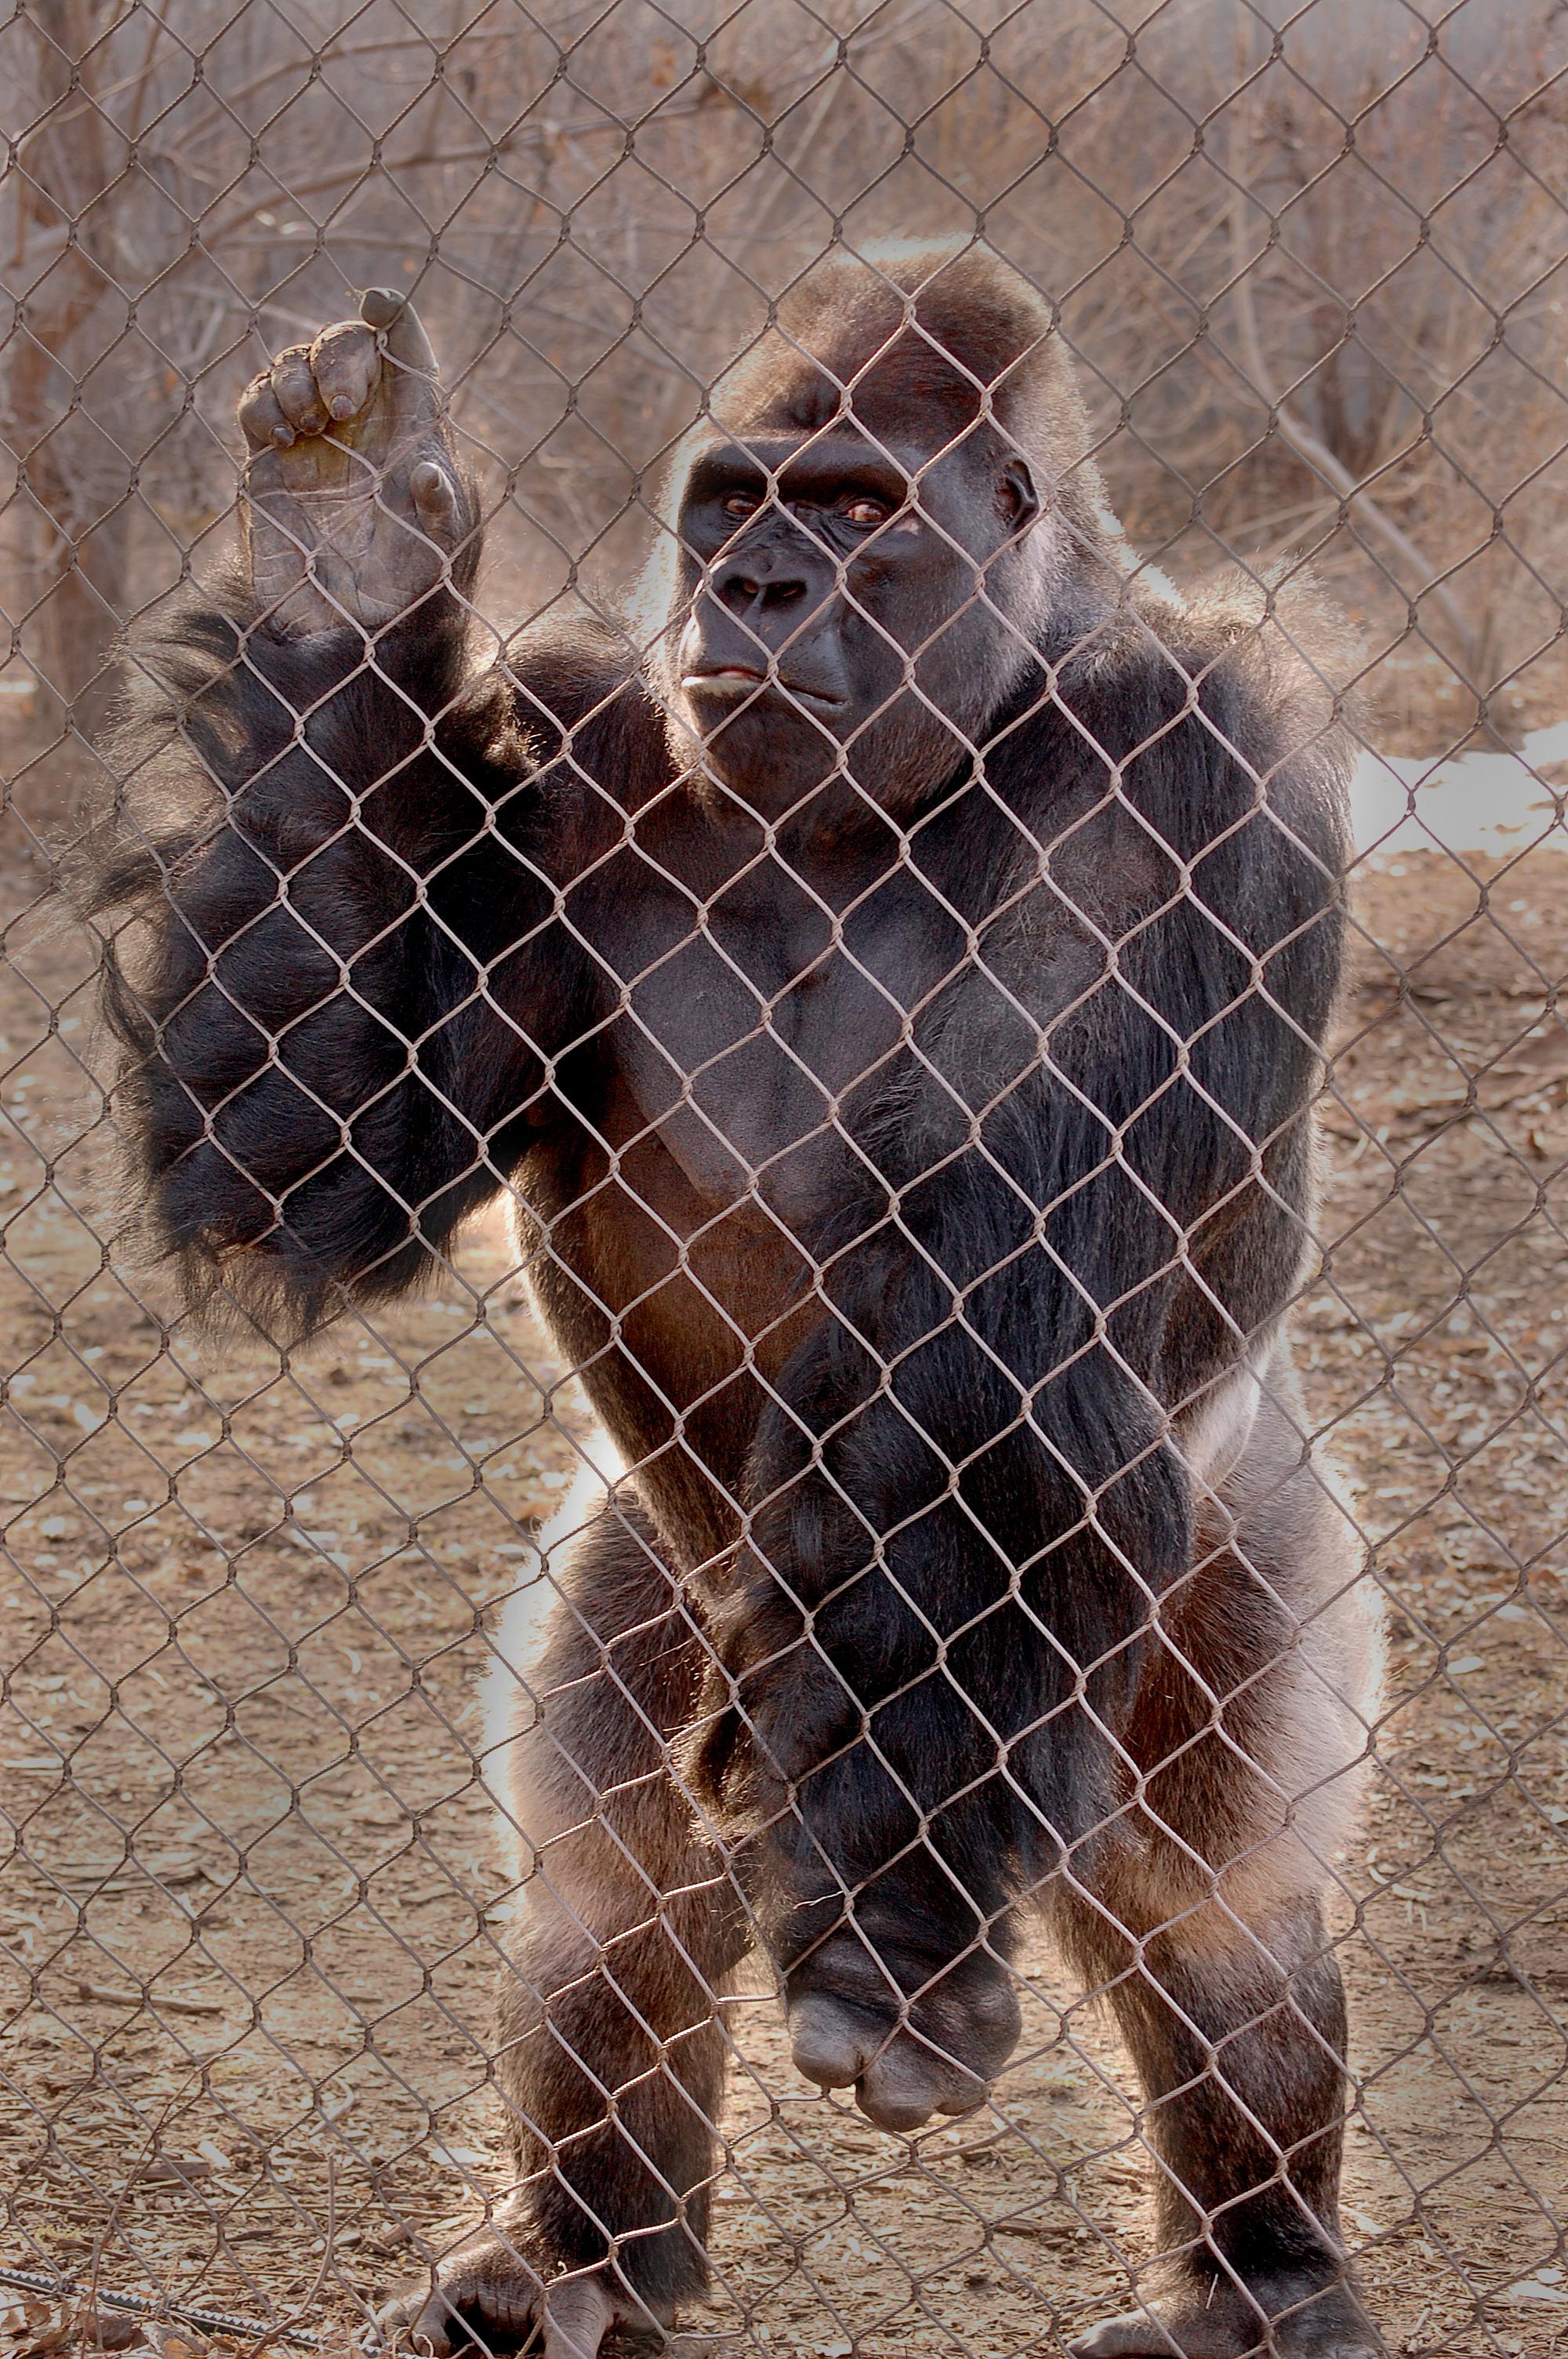 Gambar Kebun Binatang Binatang Menyusui Monyet Gorila